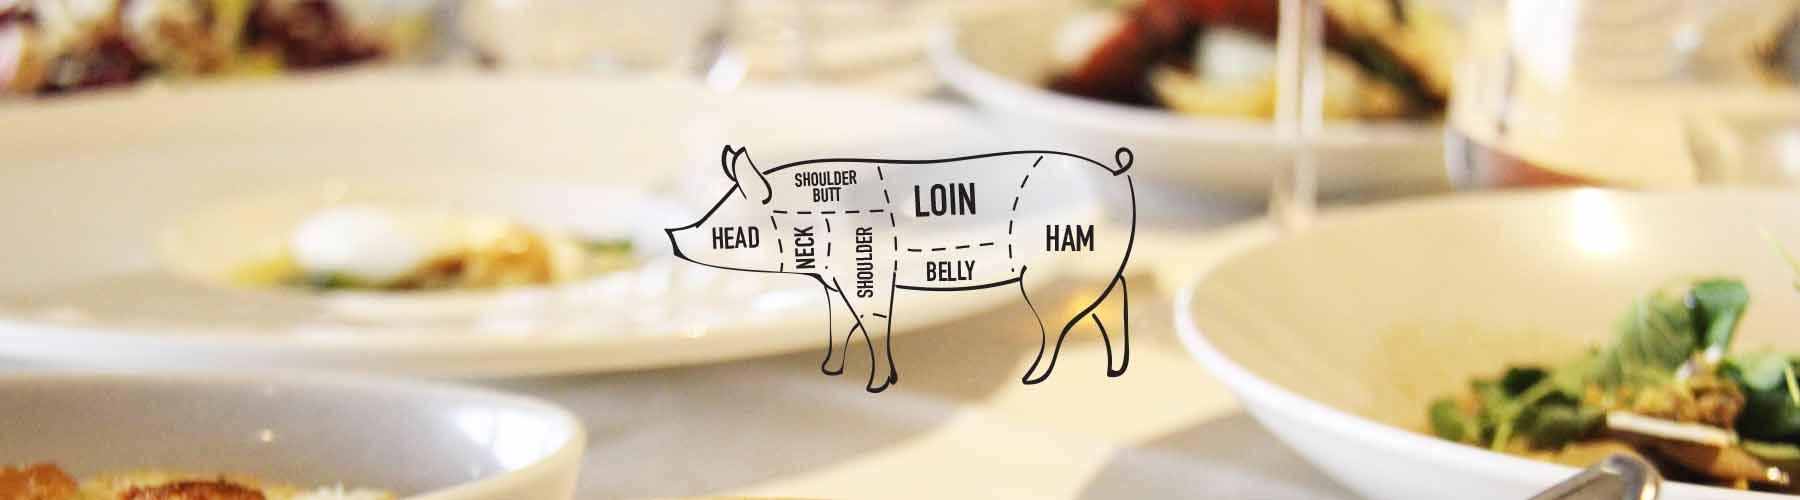 Pork on Dining Table